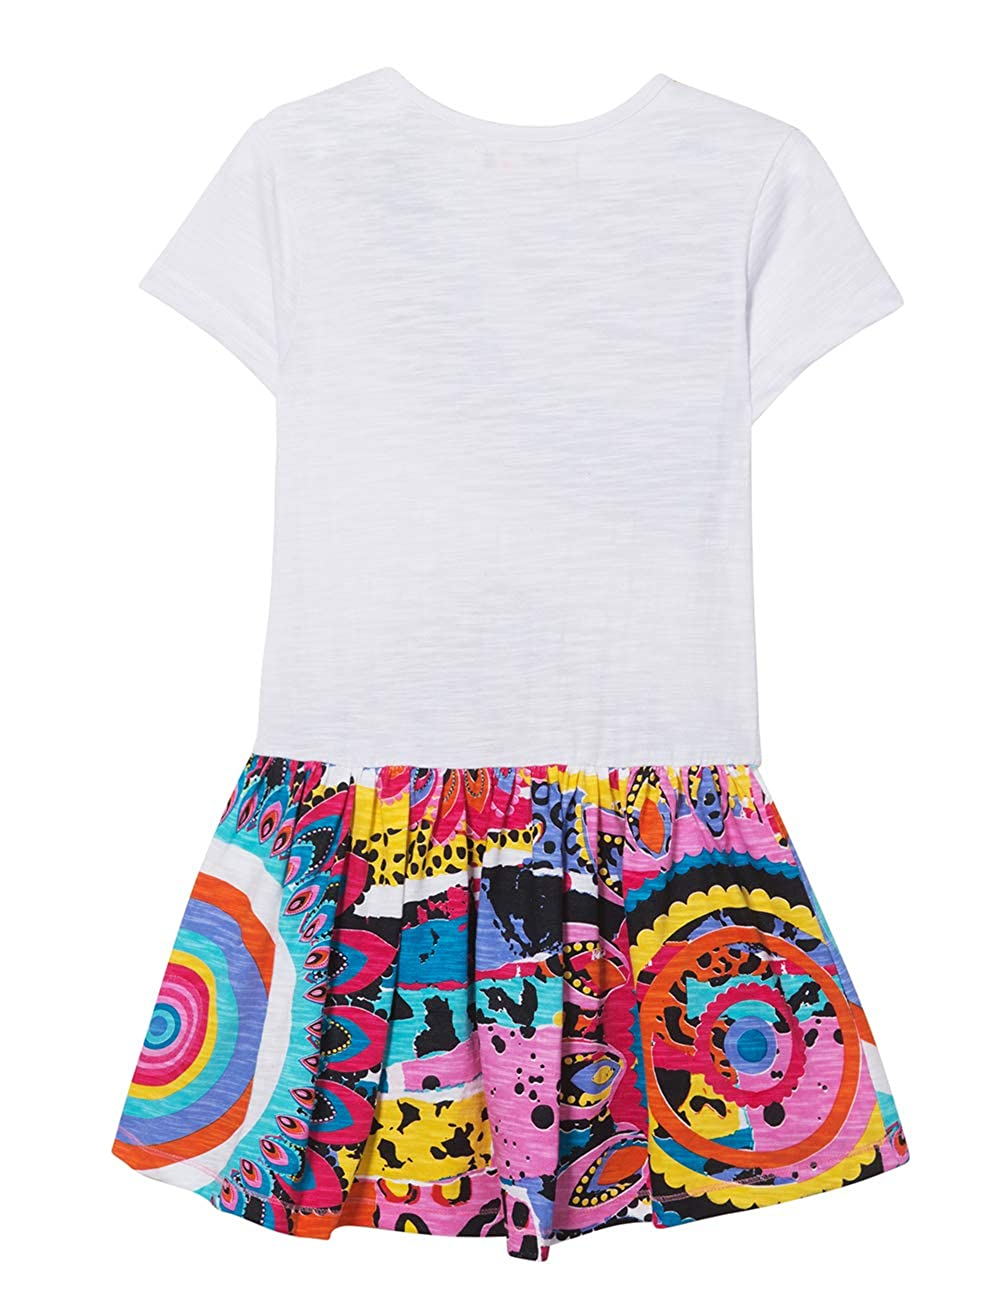 Desigual Girl Knit Dress Short Sleeve Vest/_wilminton Vestito Bambina